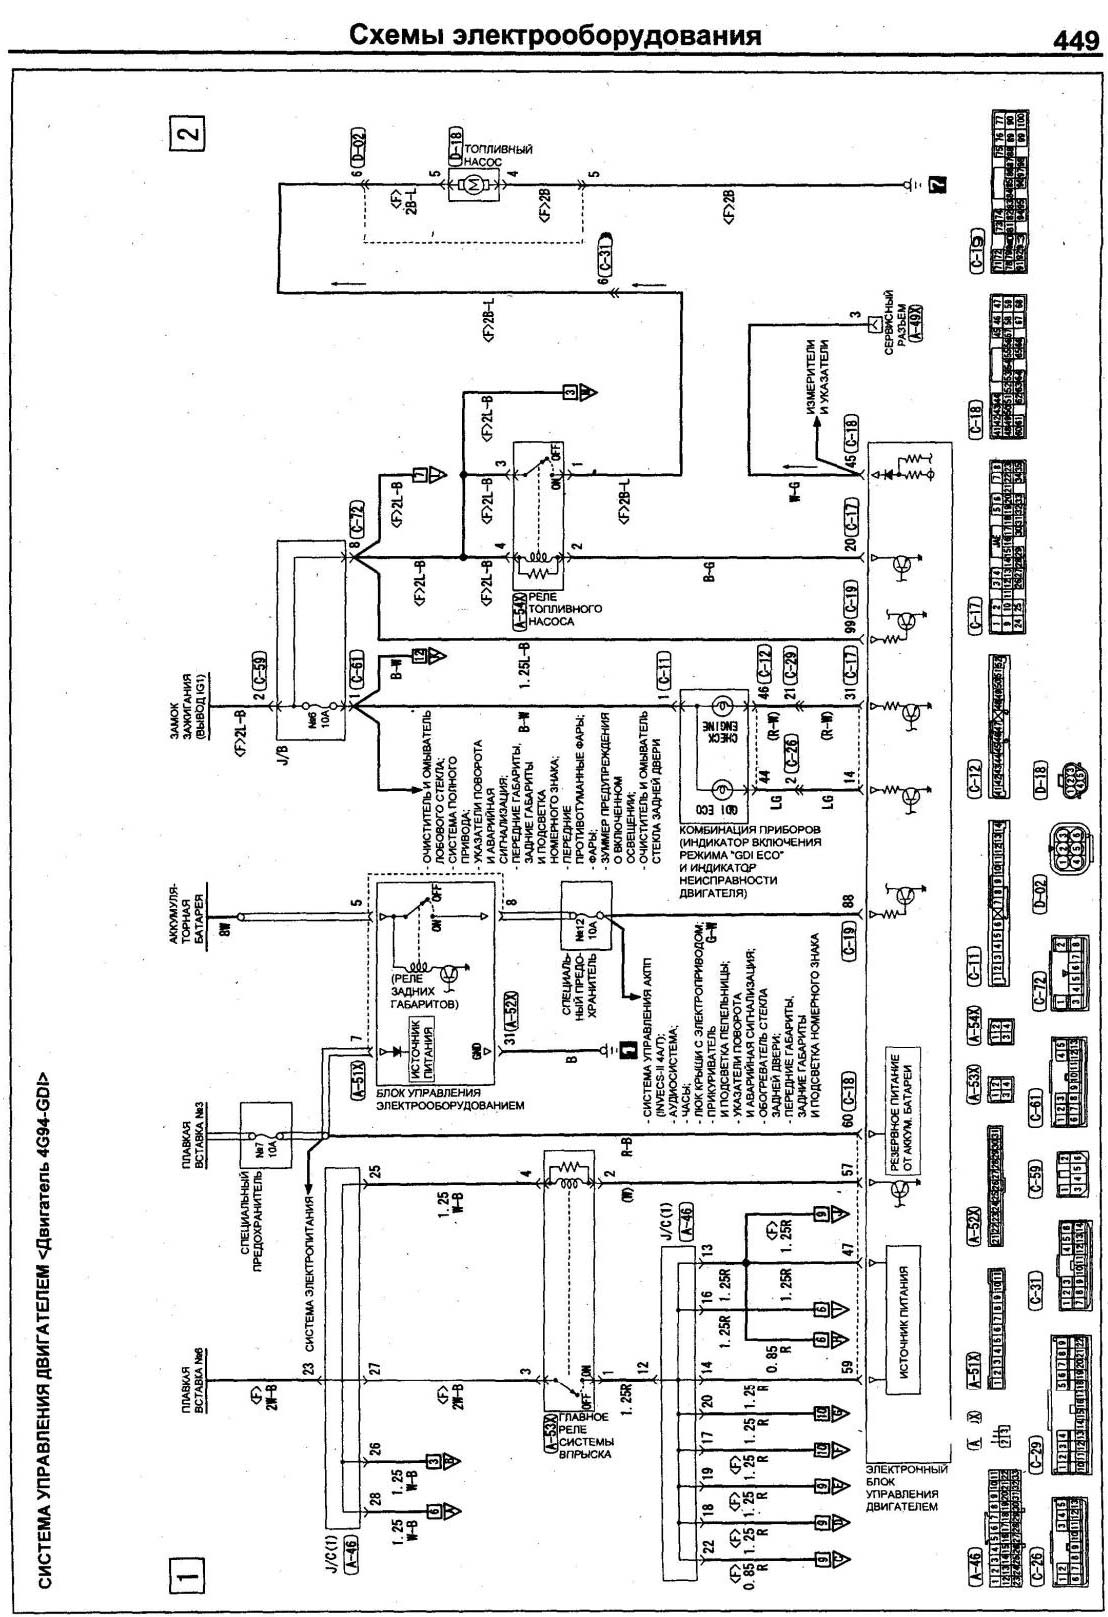 паджеро 3 схемы электрооборудования